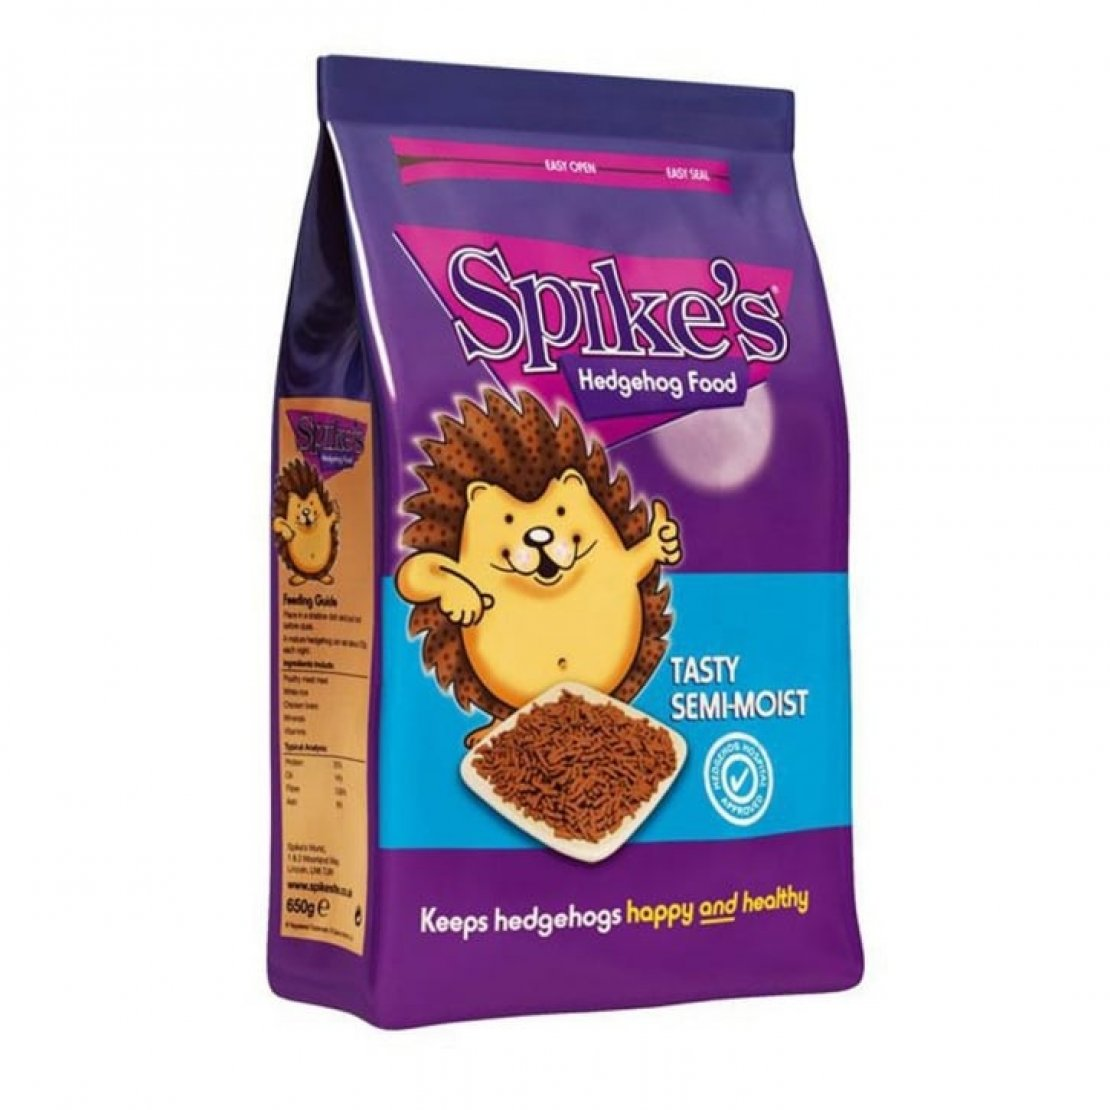 Spike's Tasty Semi-moist Hedgehog Food 550g